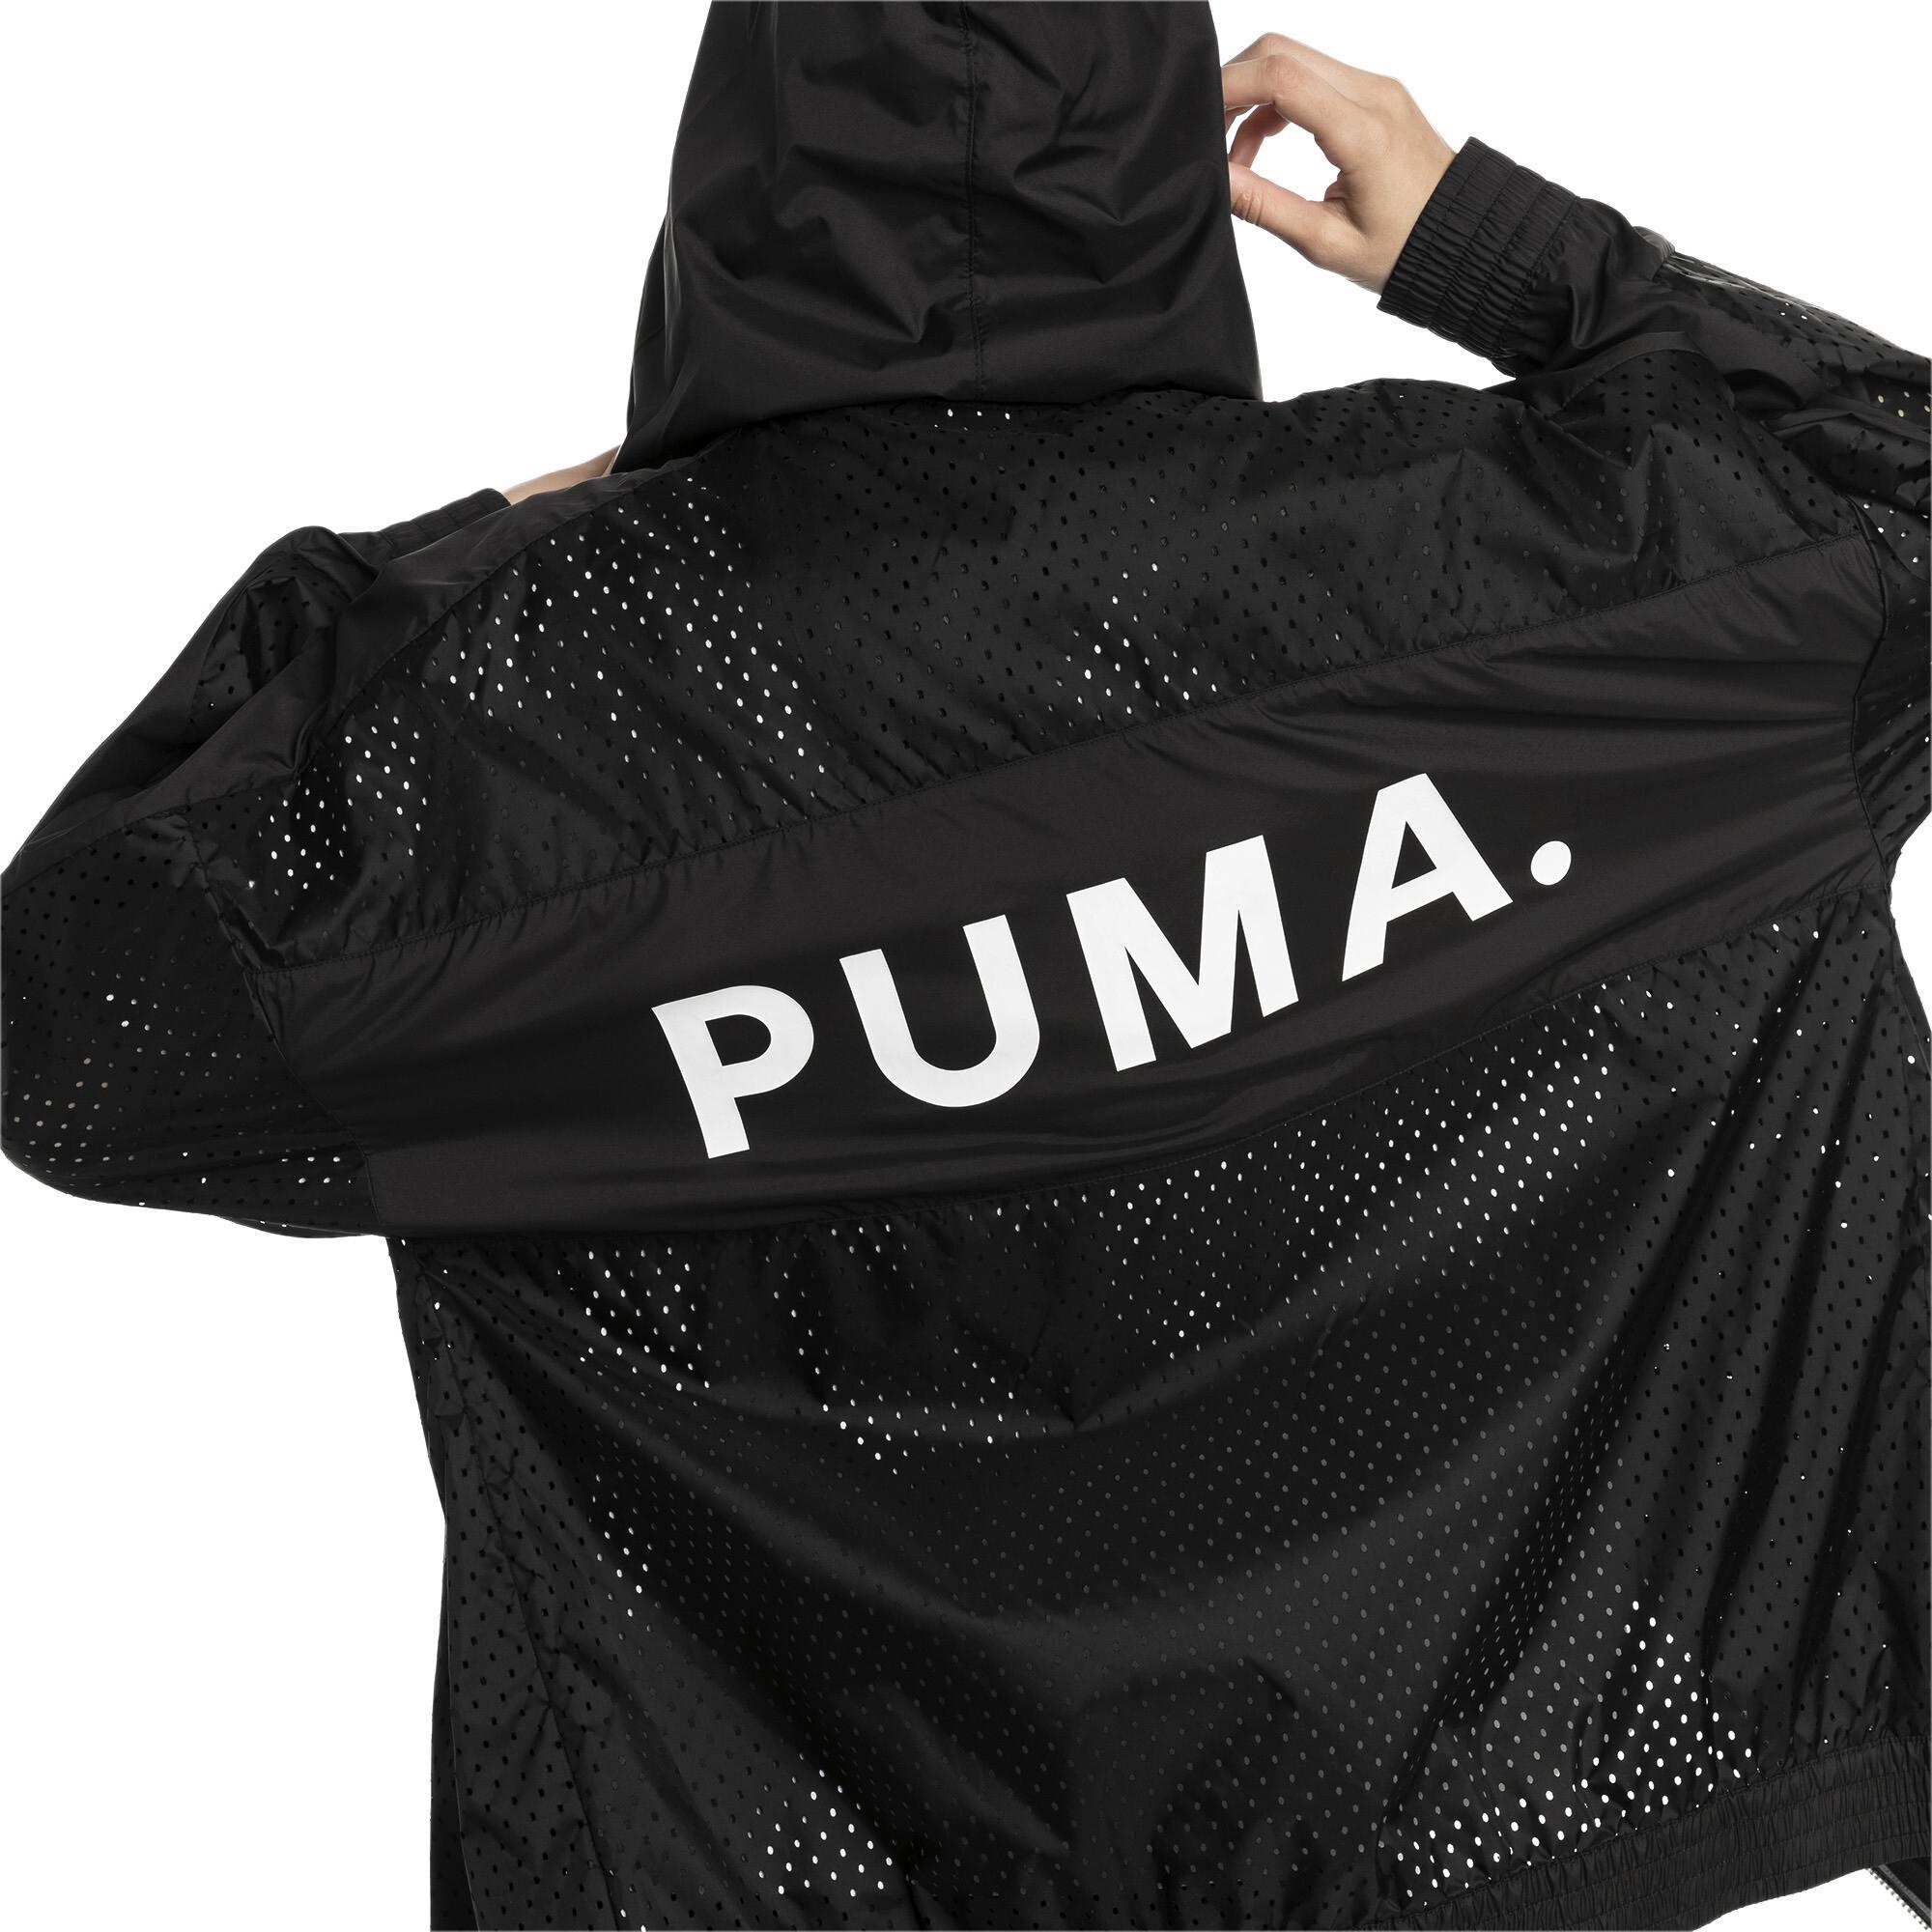 Image Puma Chase Woven Full Zip Hooded Women's Jacket #2